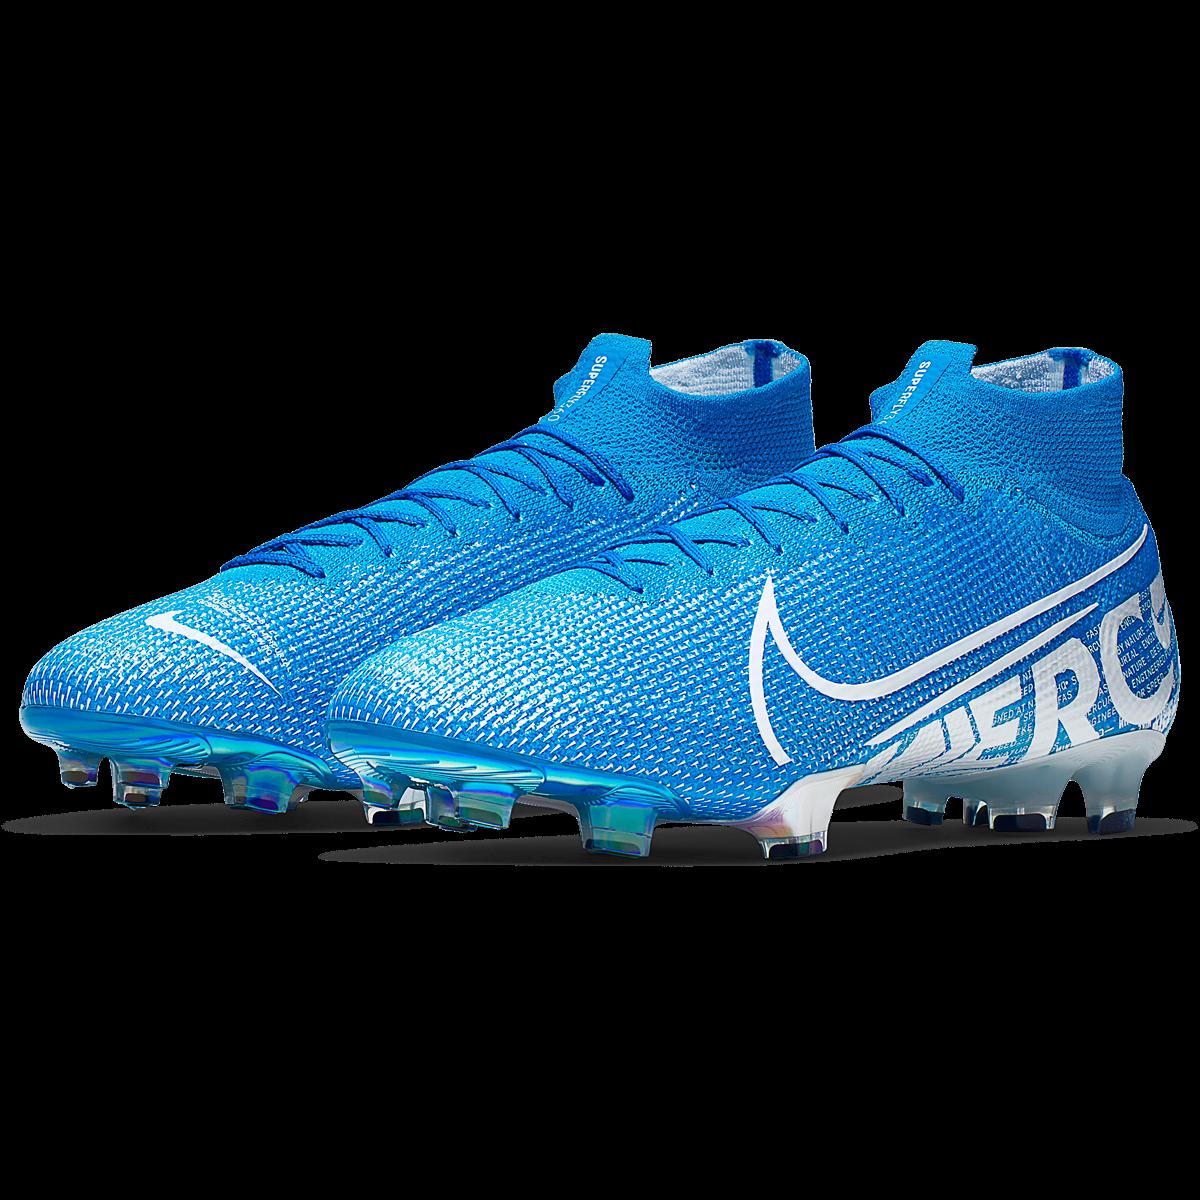 Nike Mercurial Superfly 7 Elite FG Soccer Cleat BlueWhite